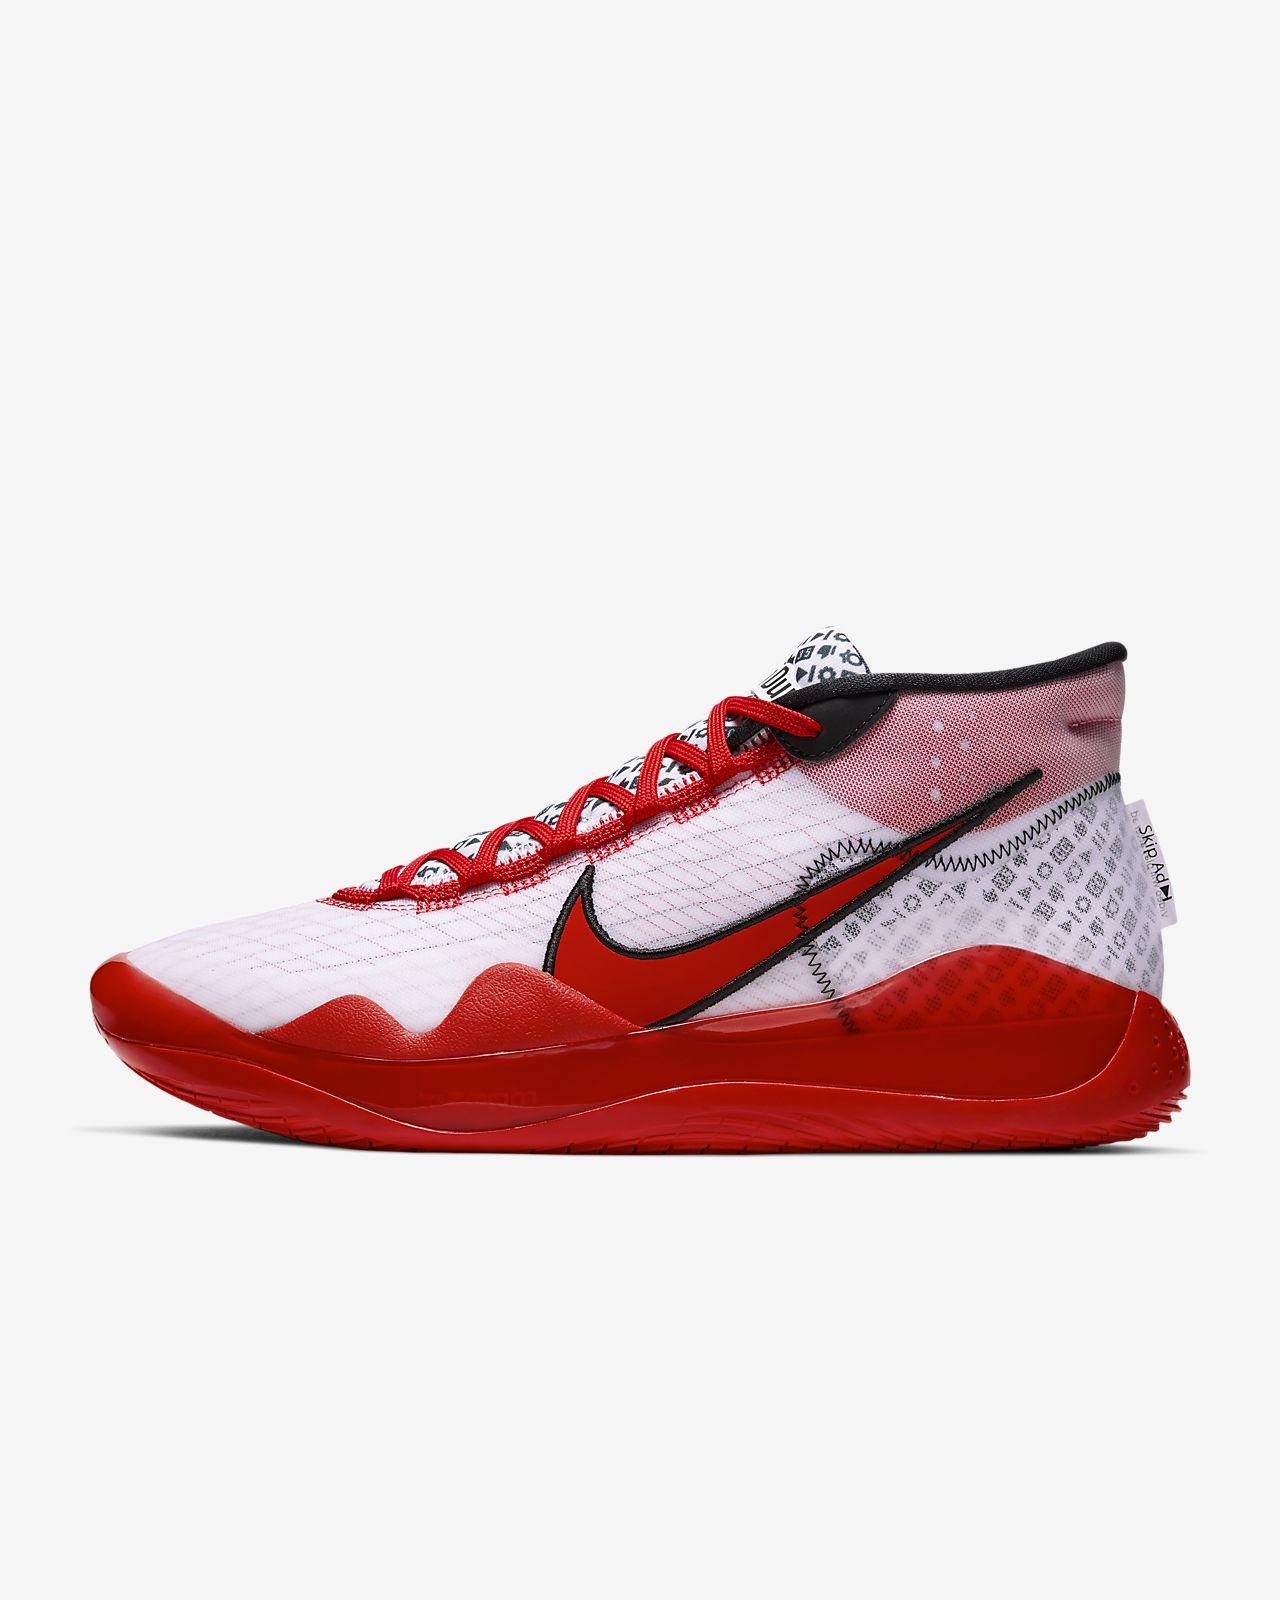 Apariencia Abuso El sendero  kd zoom shoes Kevin Durant shoes on sale